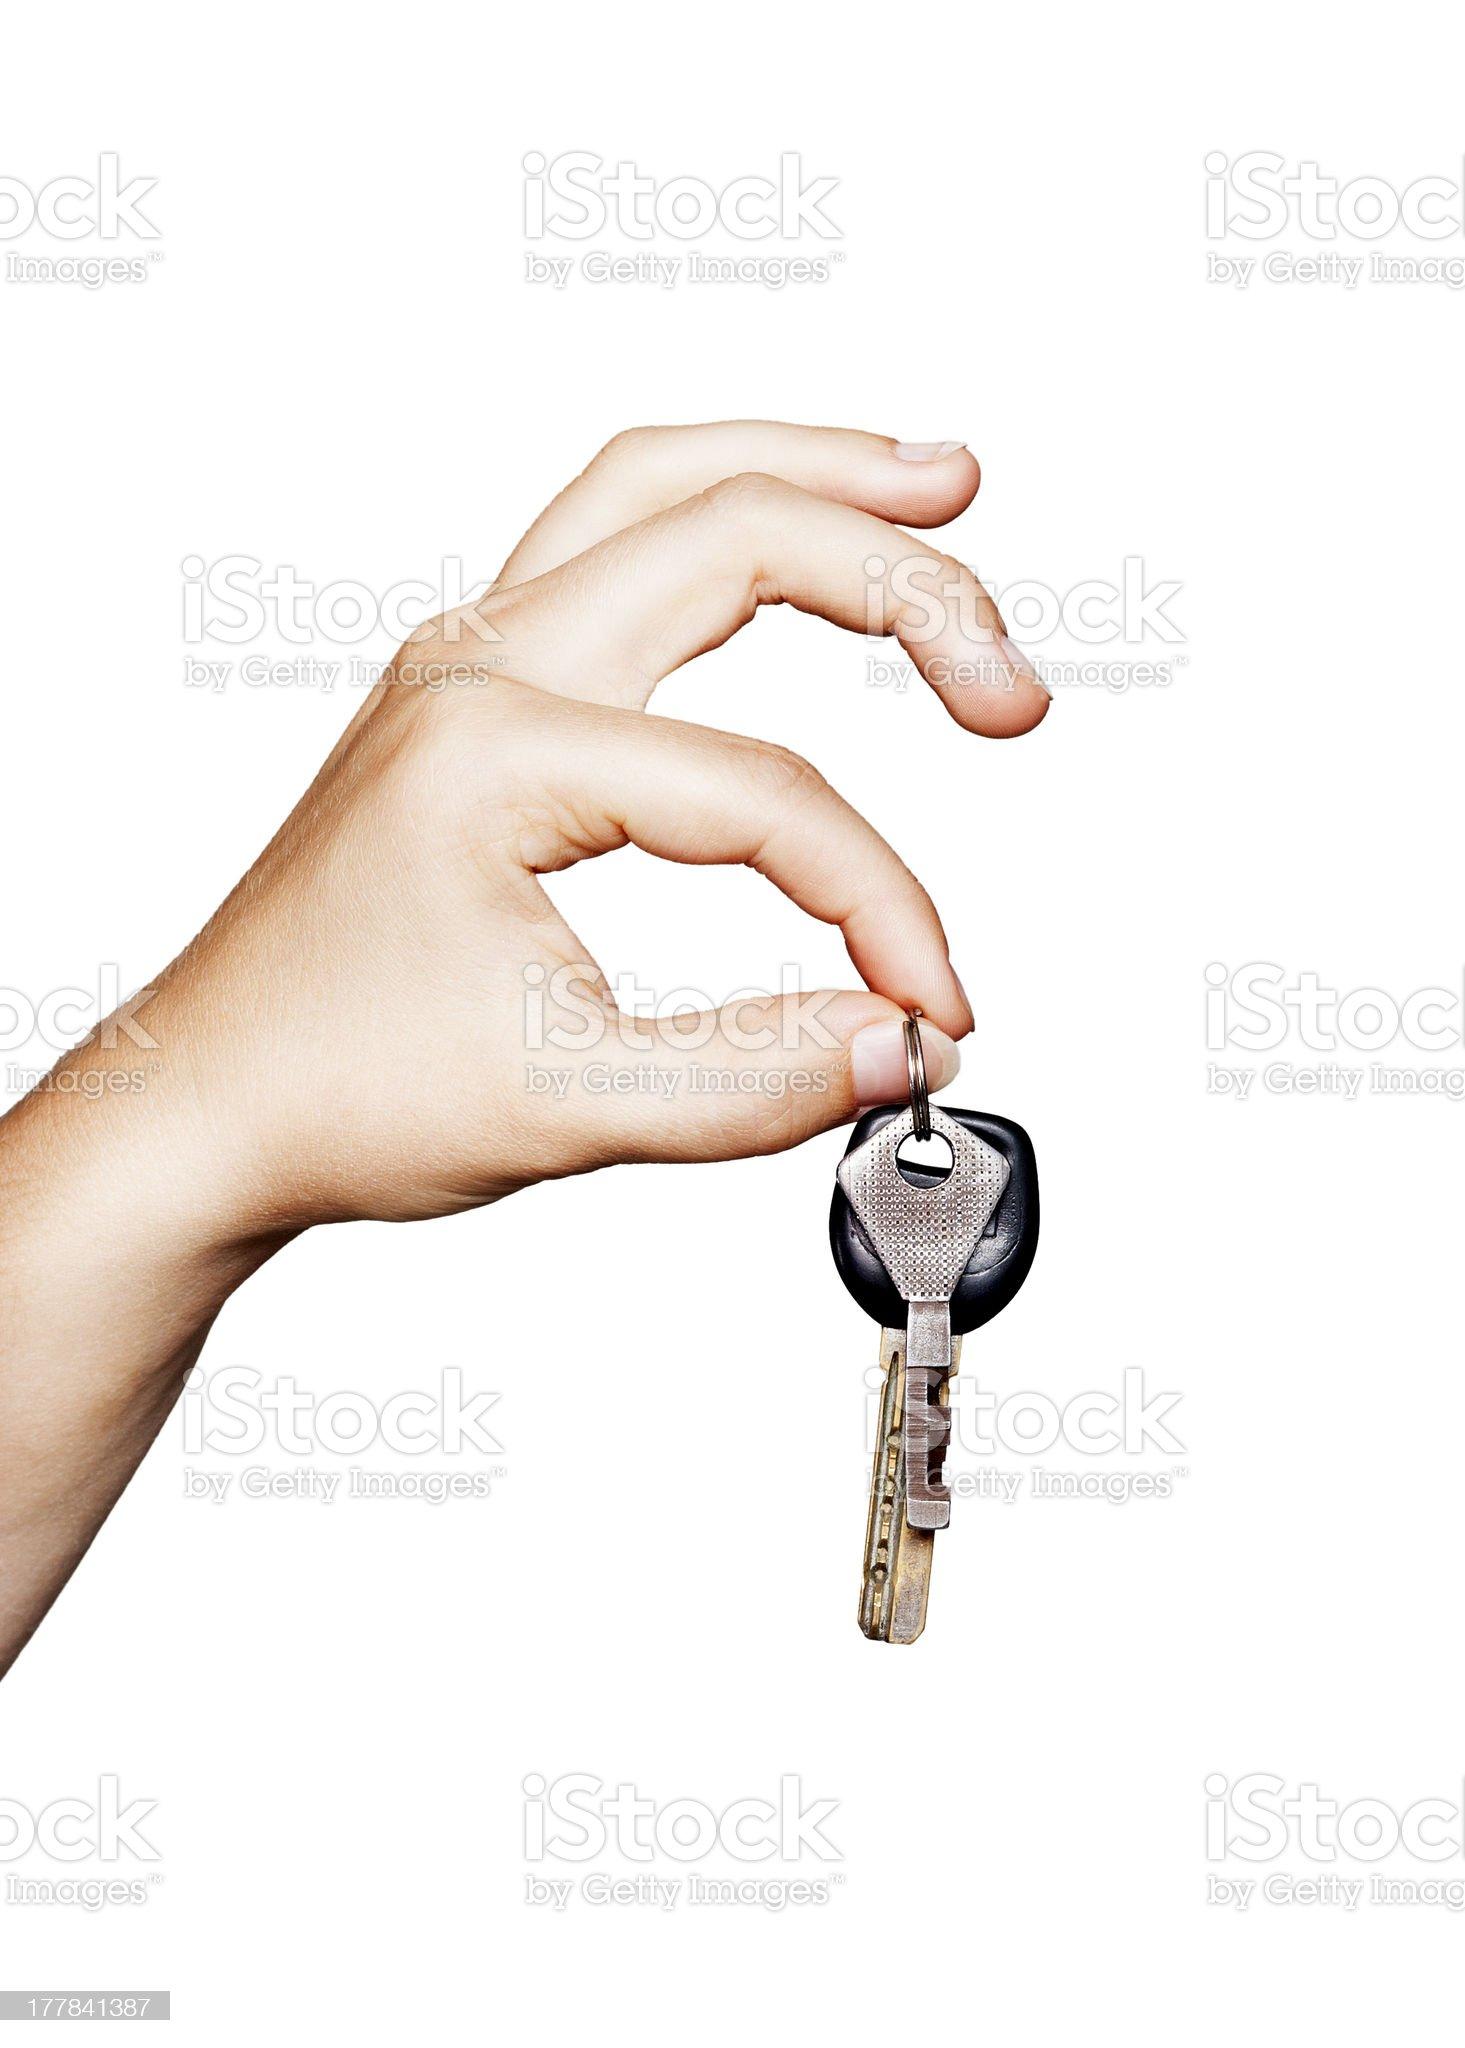 Hand holding the keys royalty-free stock photo